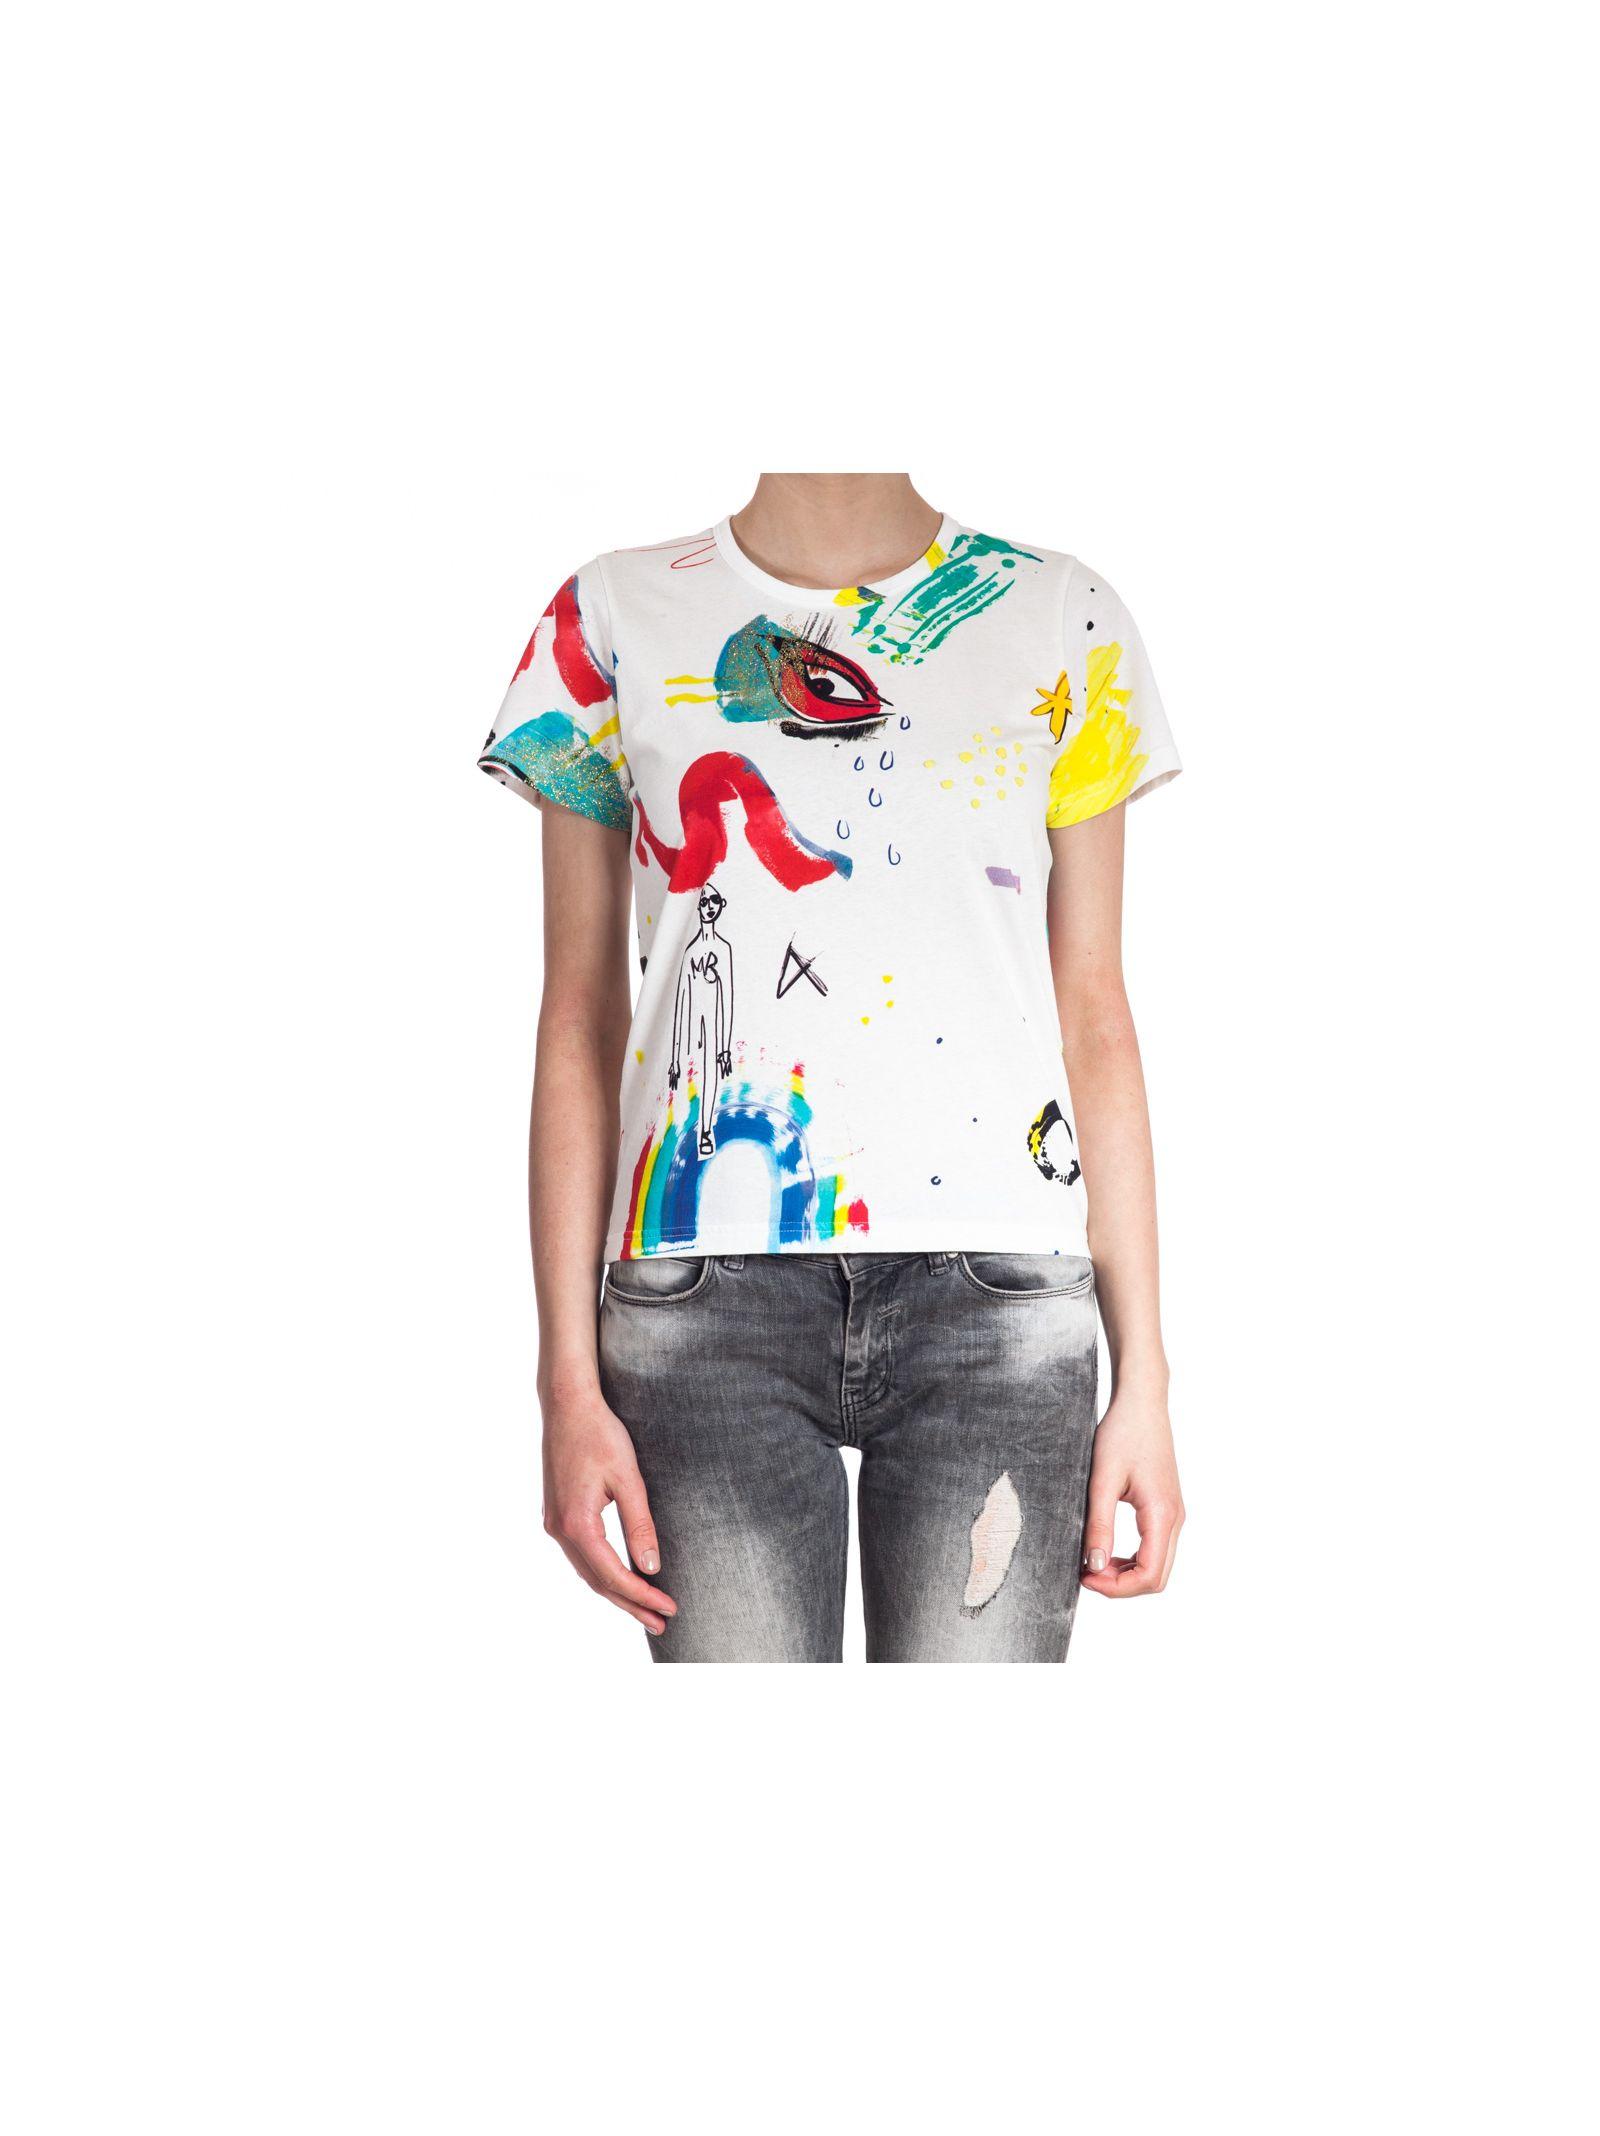 marc jacobs female marc jacobs collage print tshirt